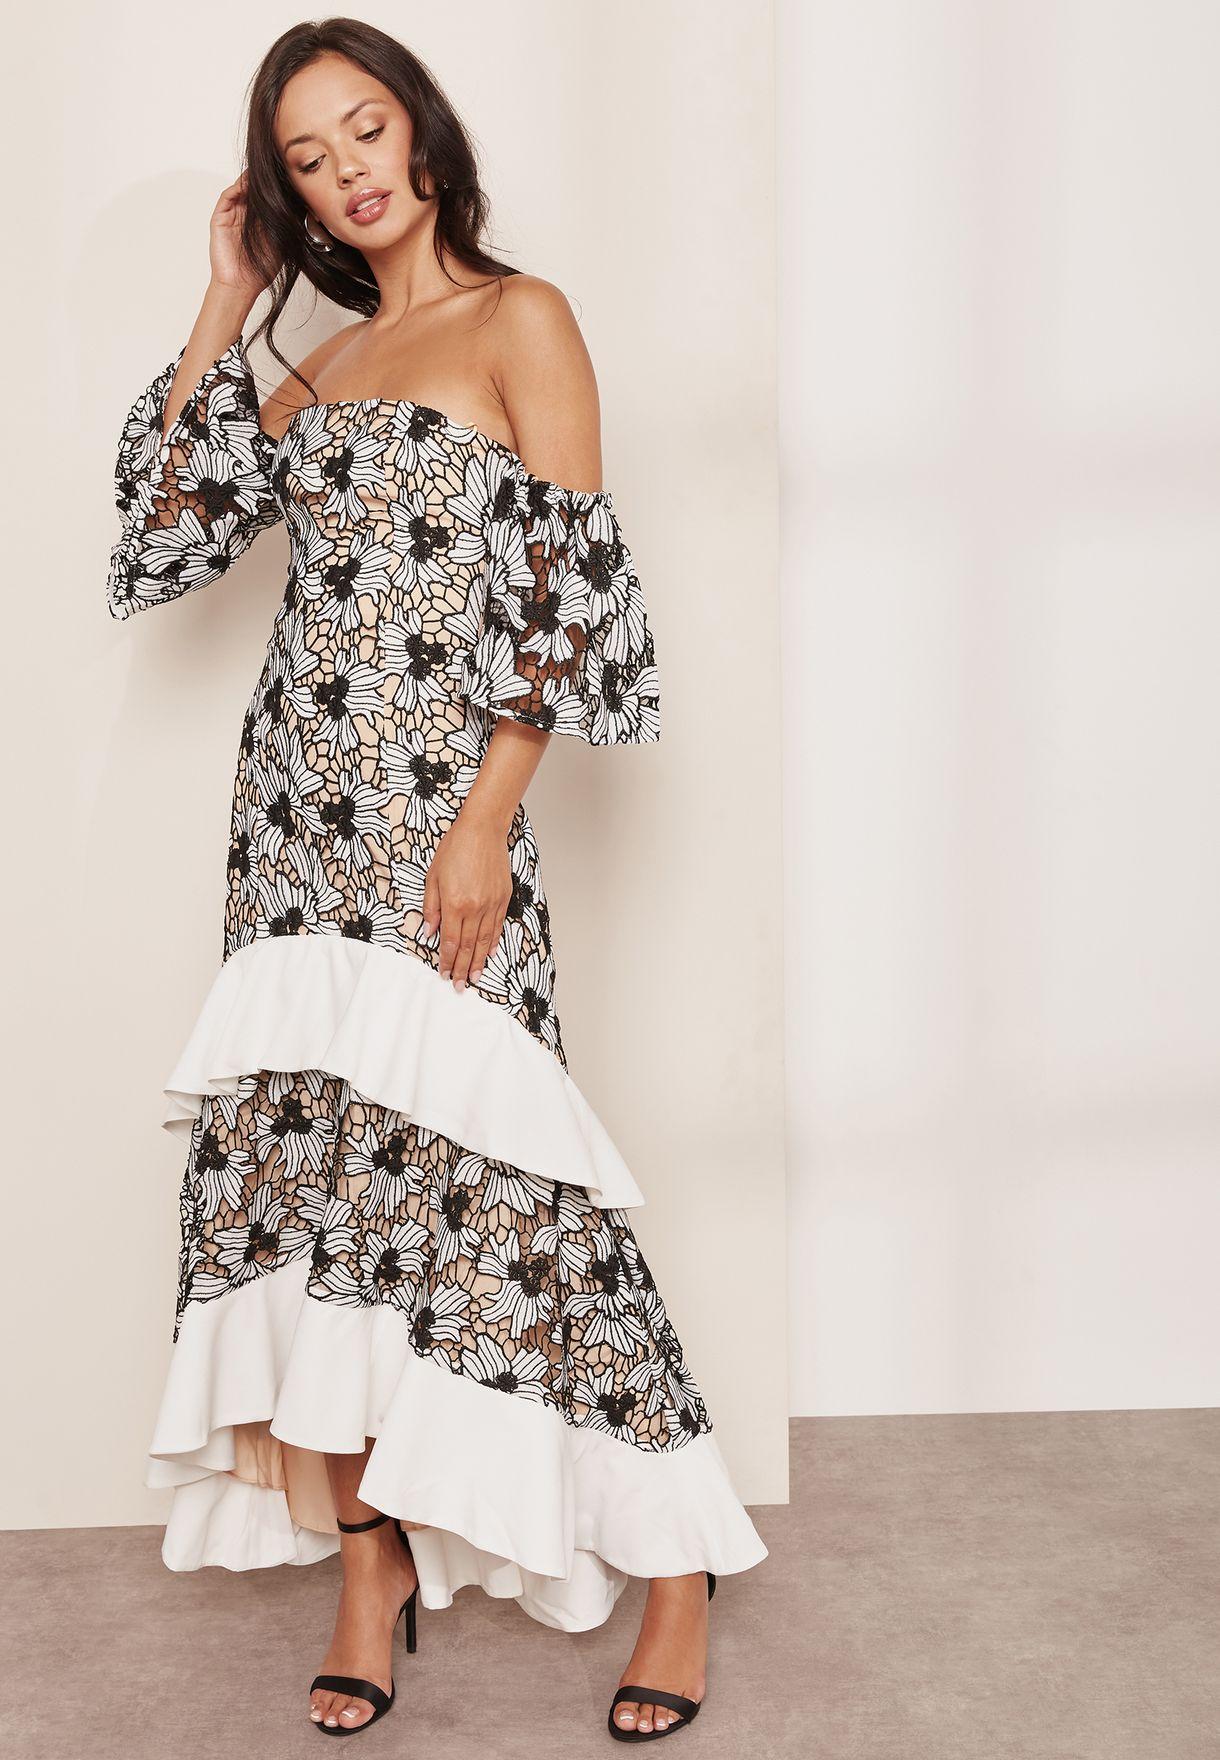 fd8e682fa2 Shop Keepsake monochrome Contrast Ruffle Bardot Lace Maxi Dress 3 ...